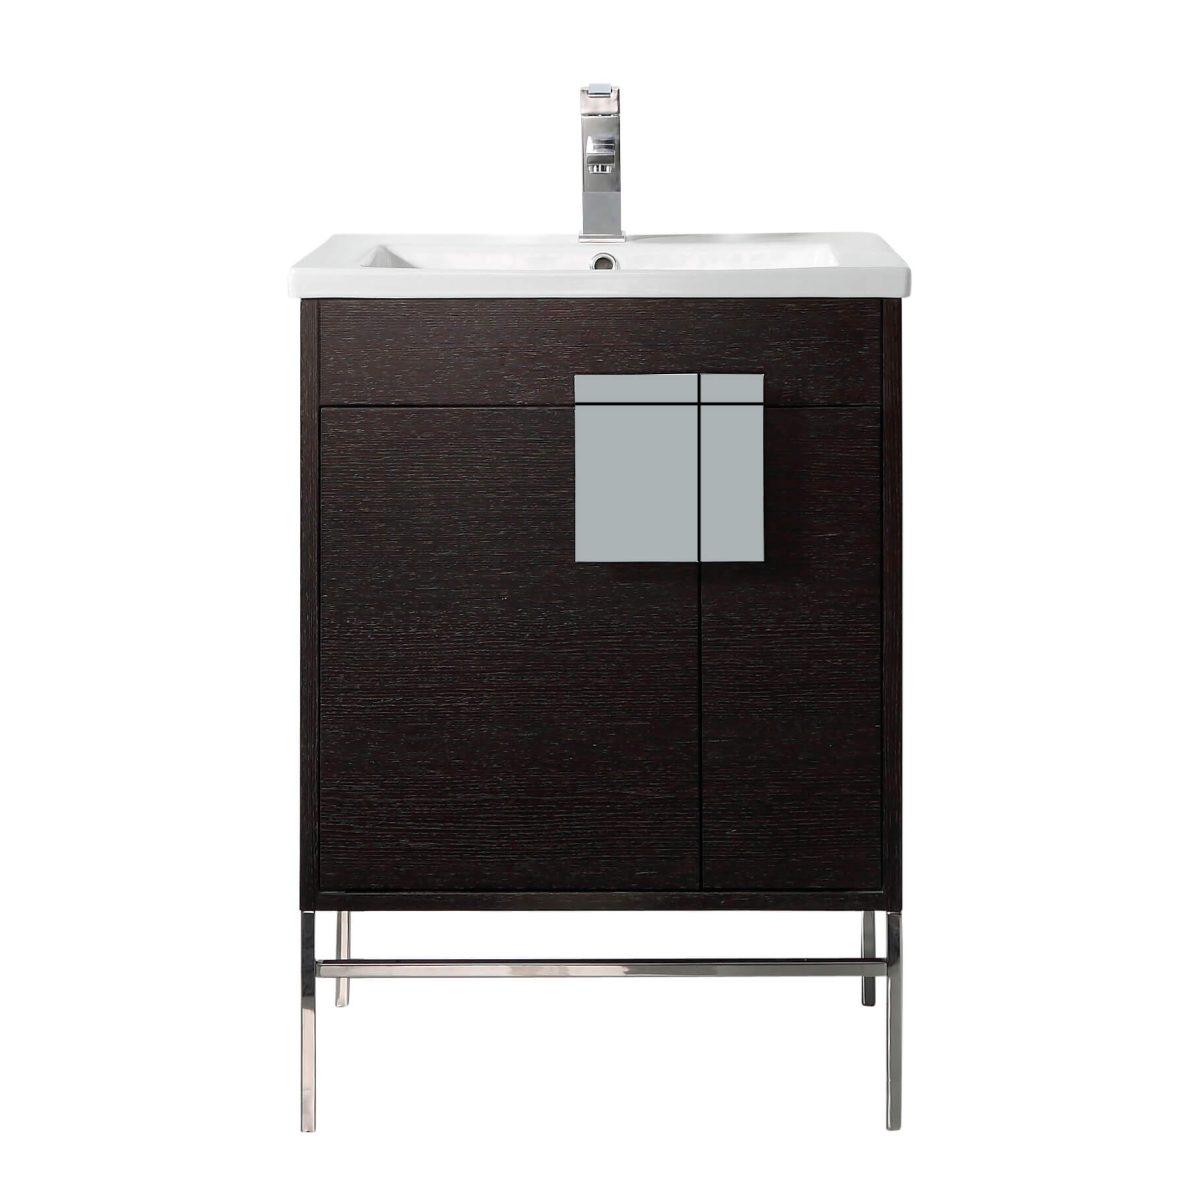 "Shawbridge 24"" Modern Bathroom Vanity  Black Oak Straight Grain with Polished Chrome Hardware"